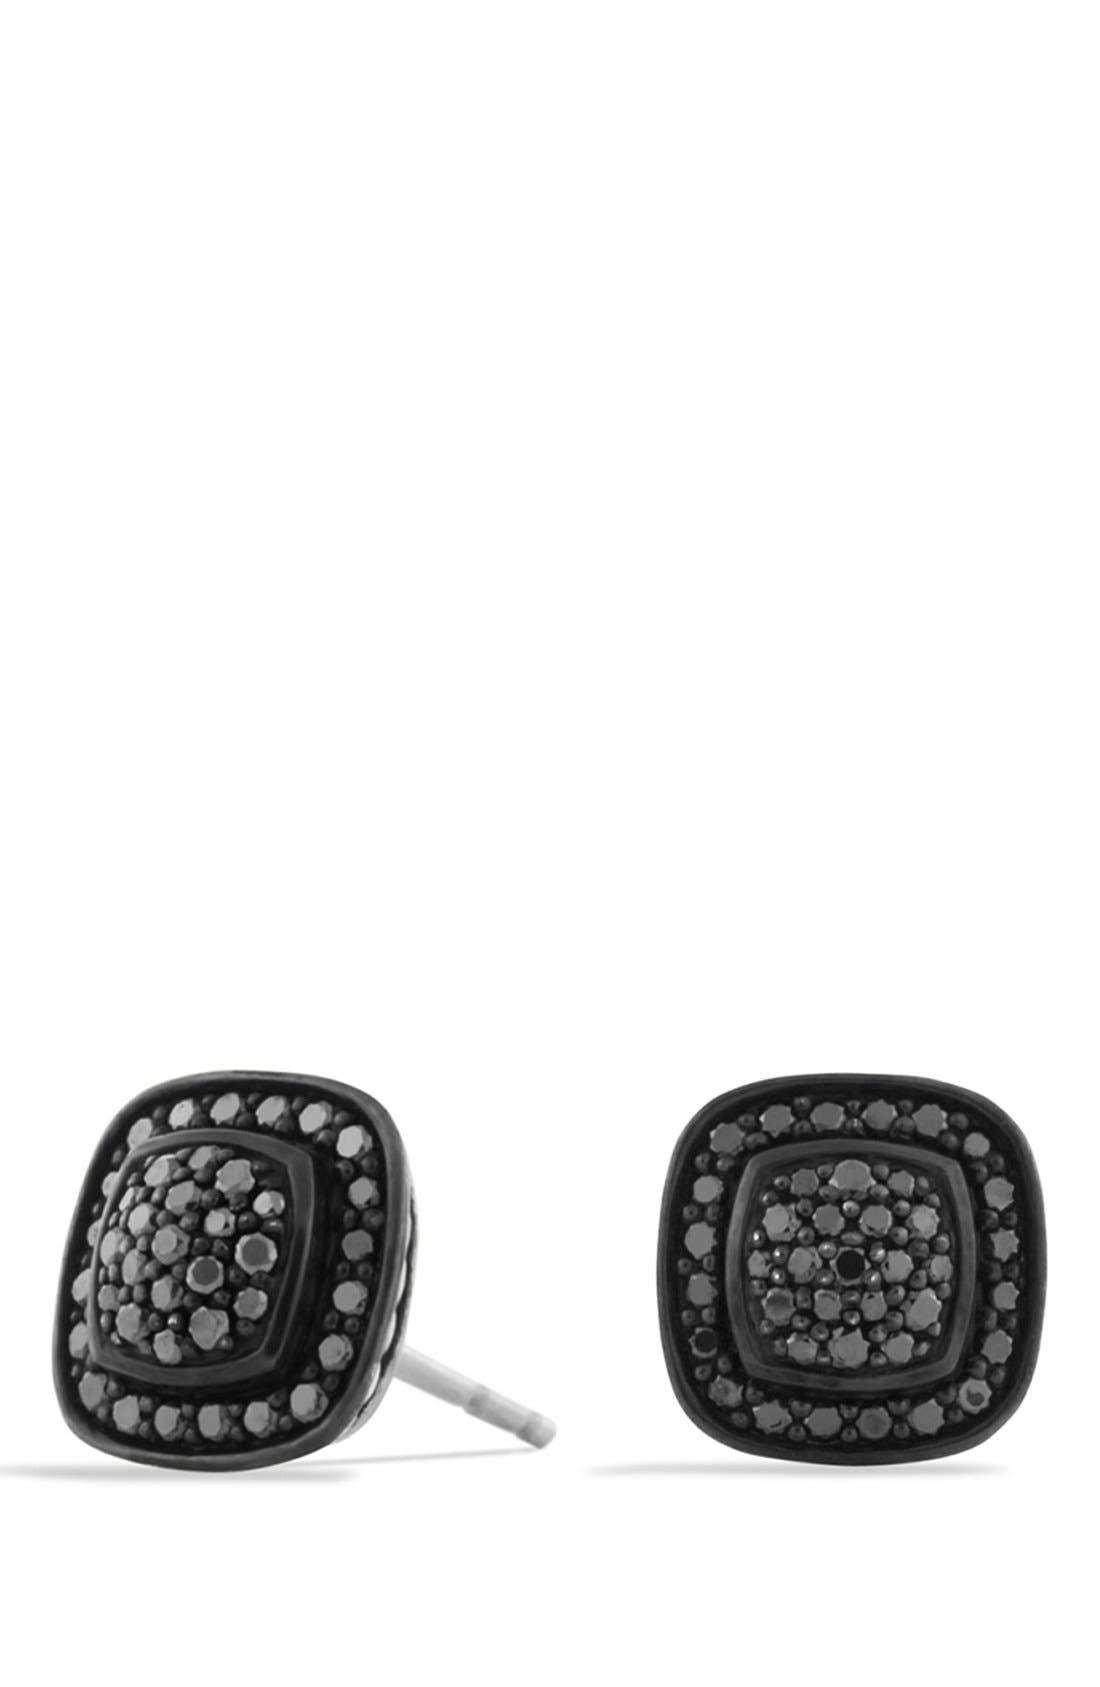 David Yurman 'Albion' Petite Earrings with Black Diamonds